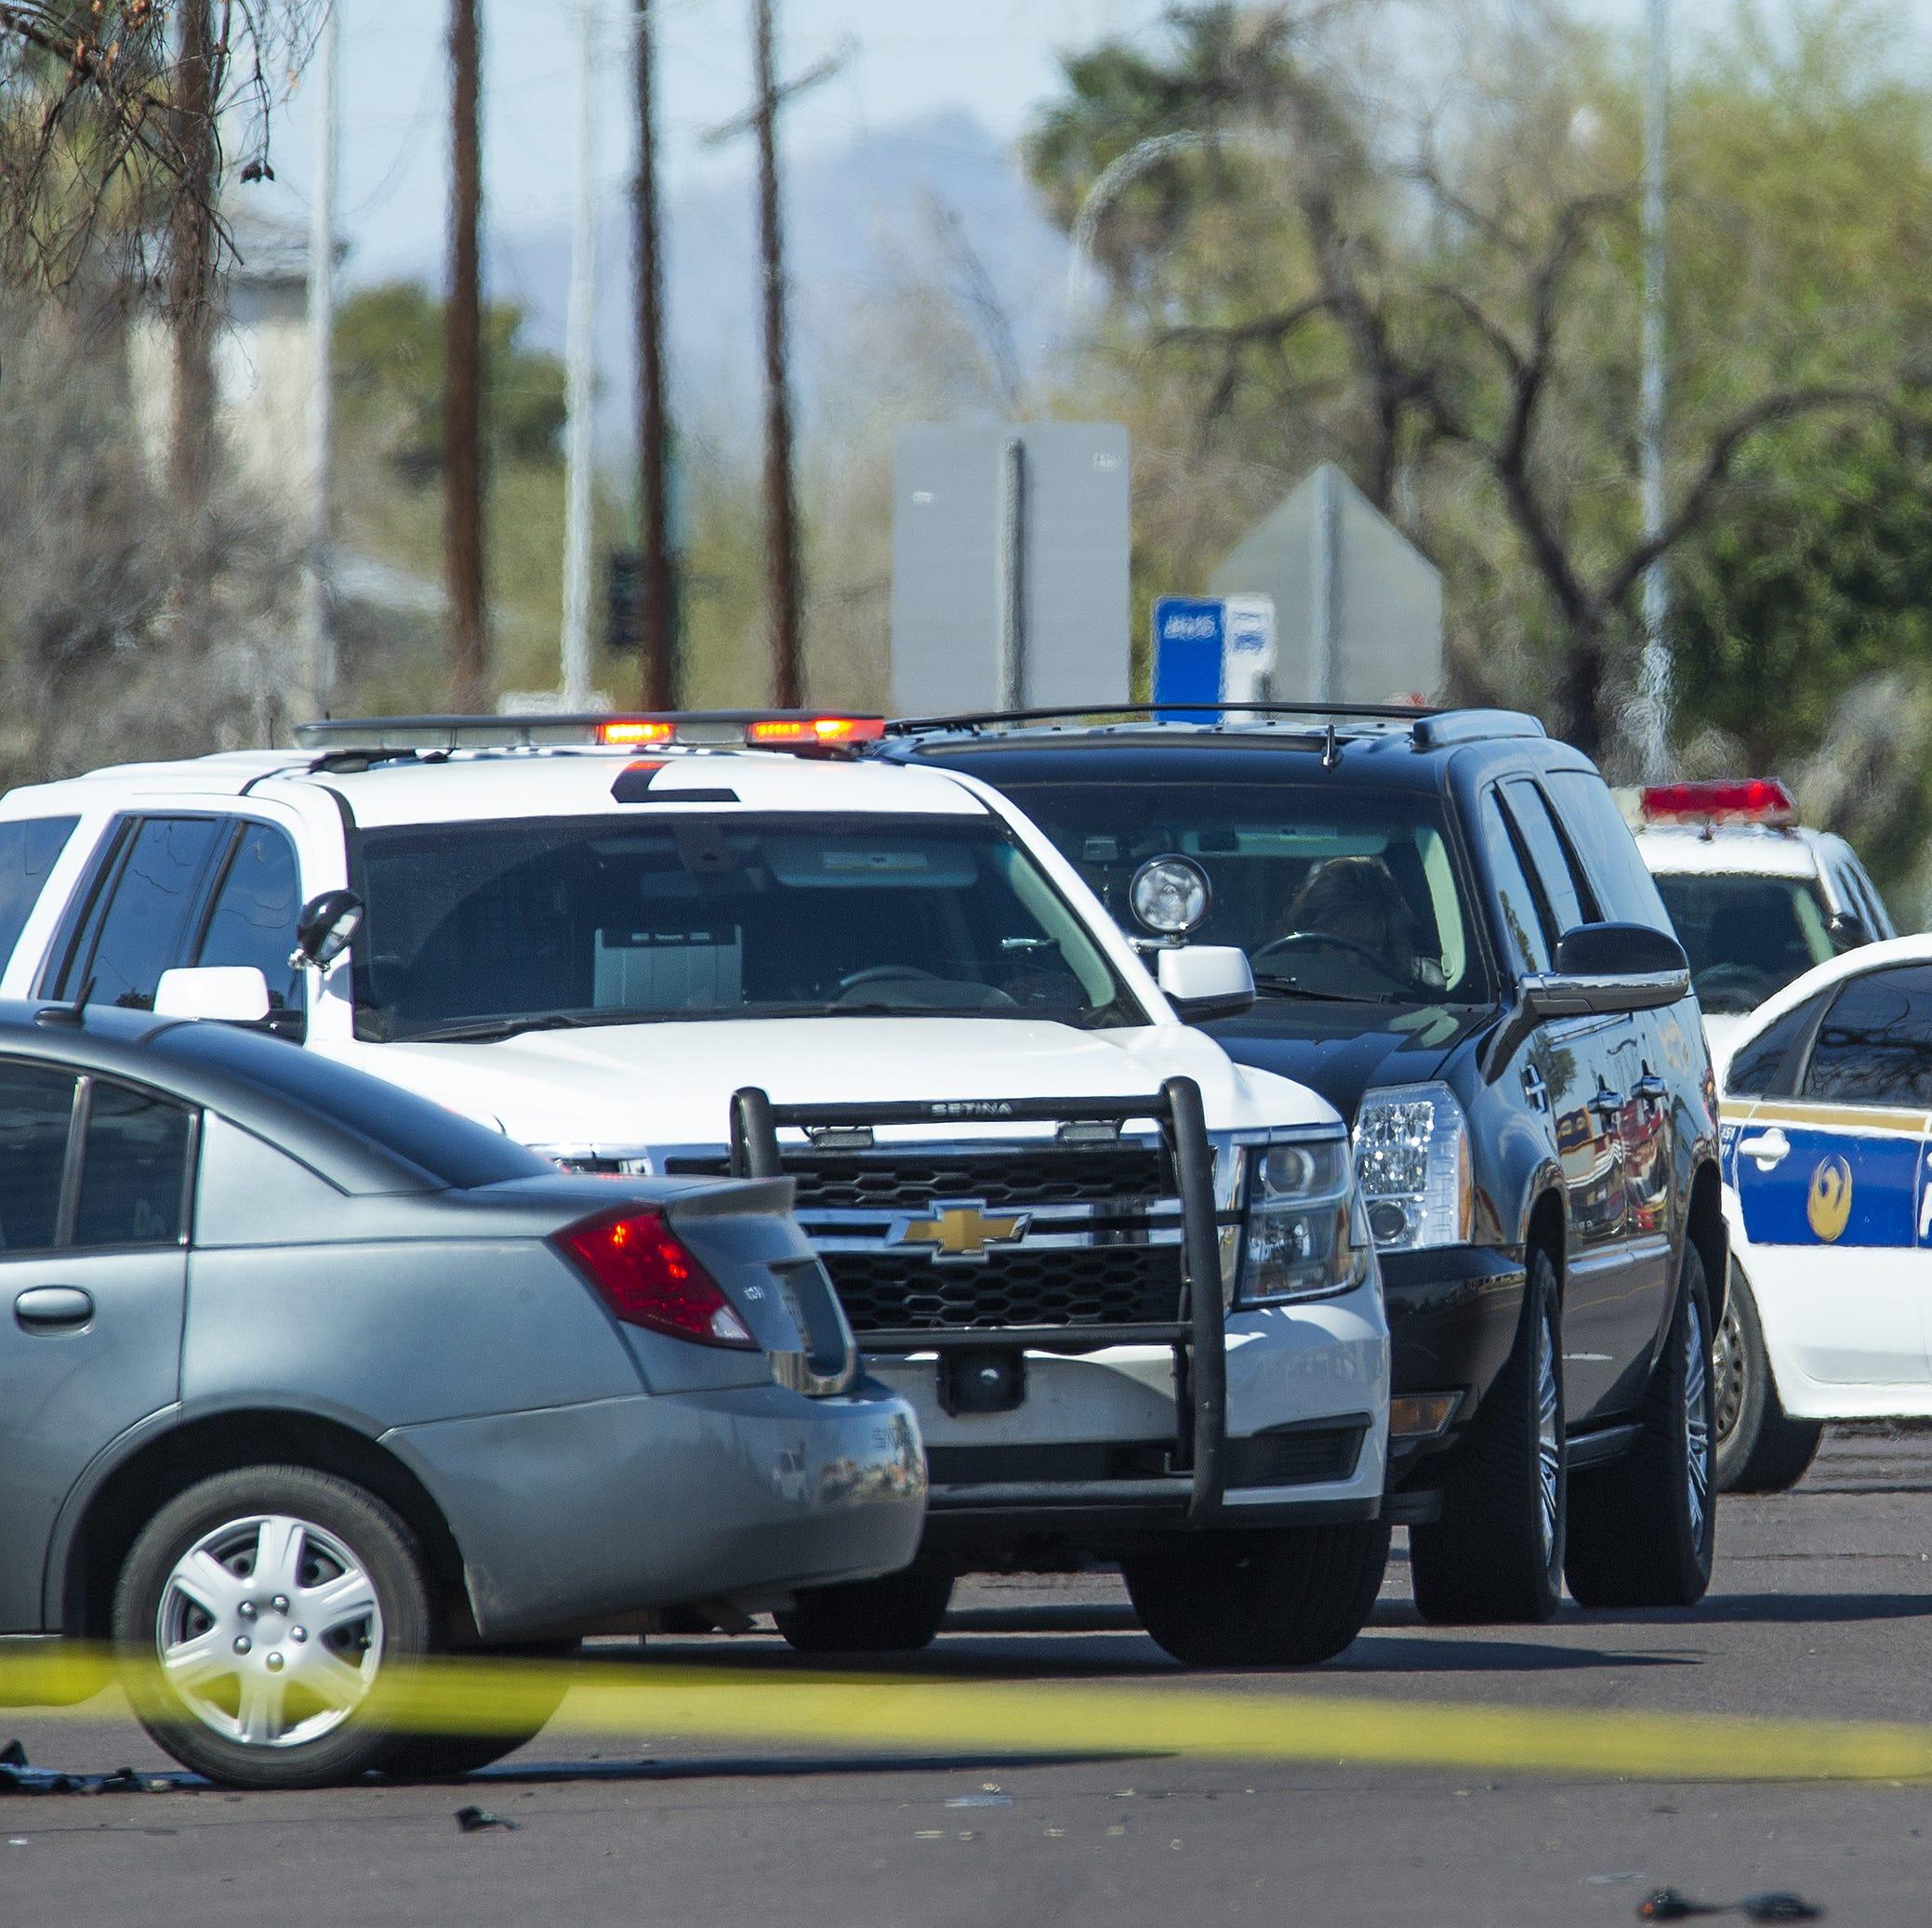 23-year Phoenix police veteran dead after being struck during crash investigation